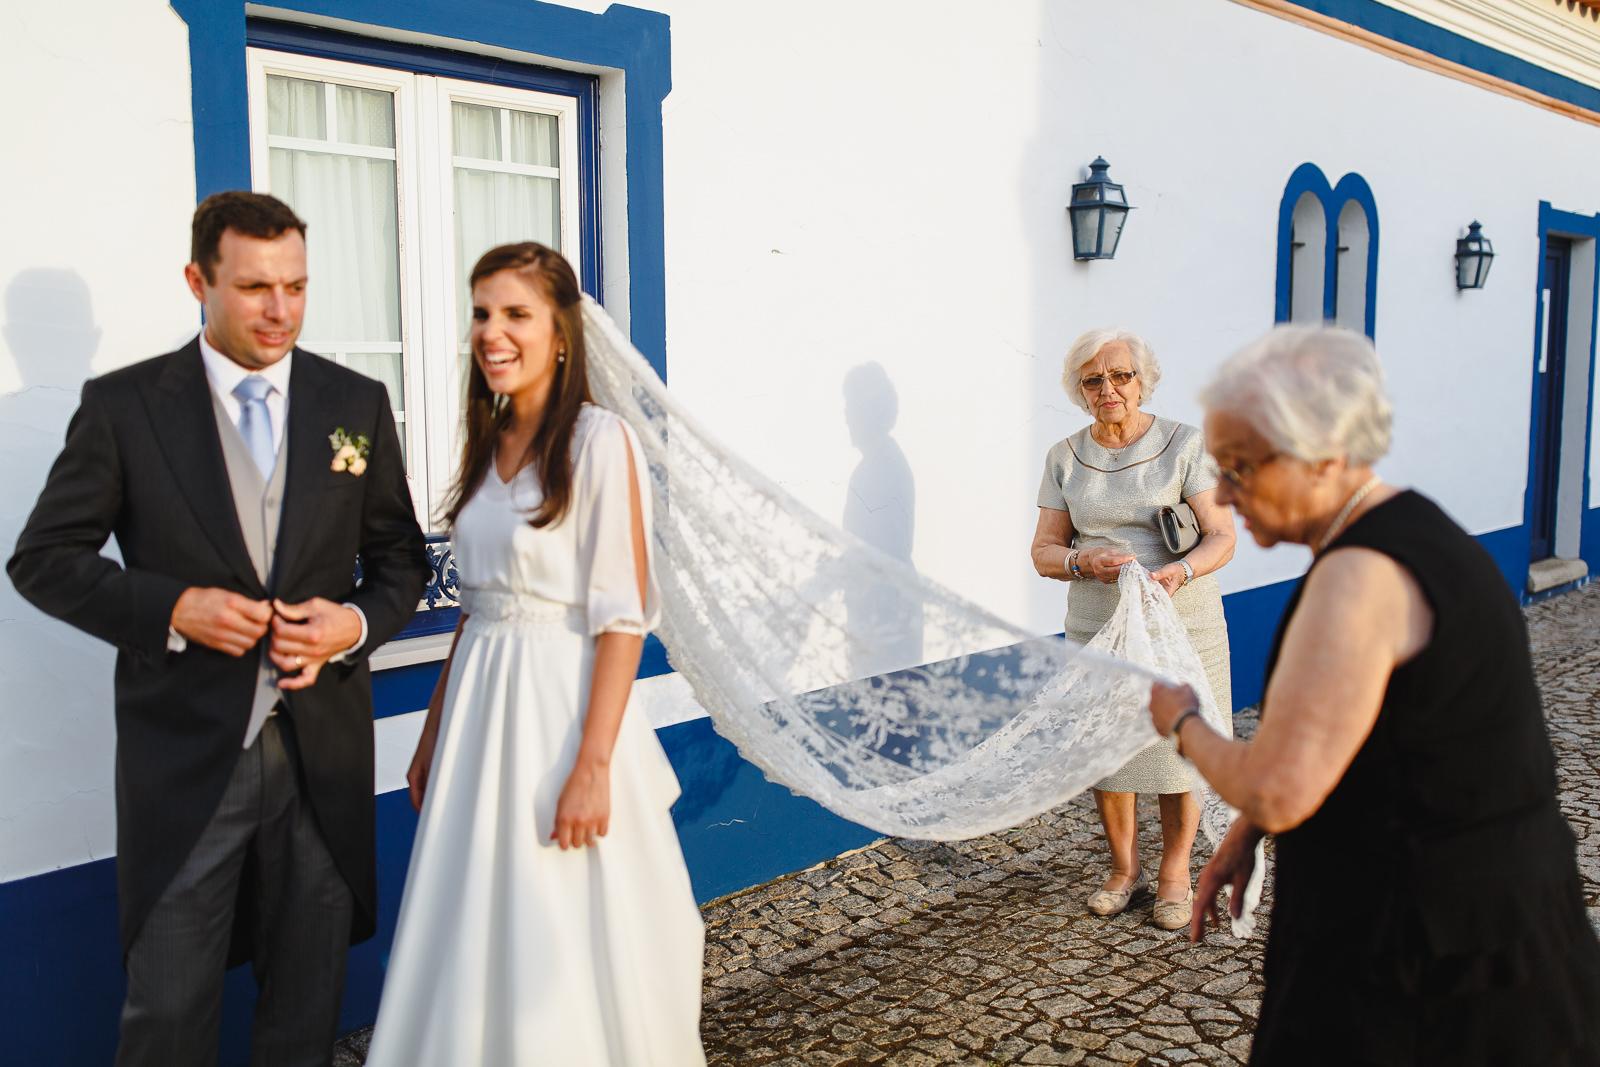 casamento_Ana_e_Carlos_5D1_0122.jpg